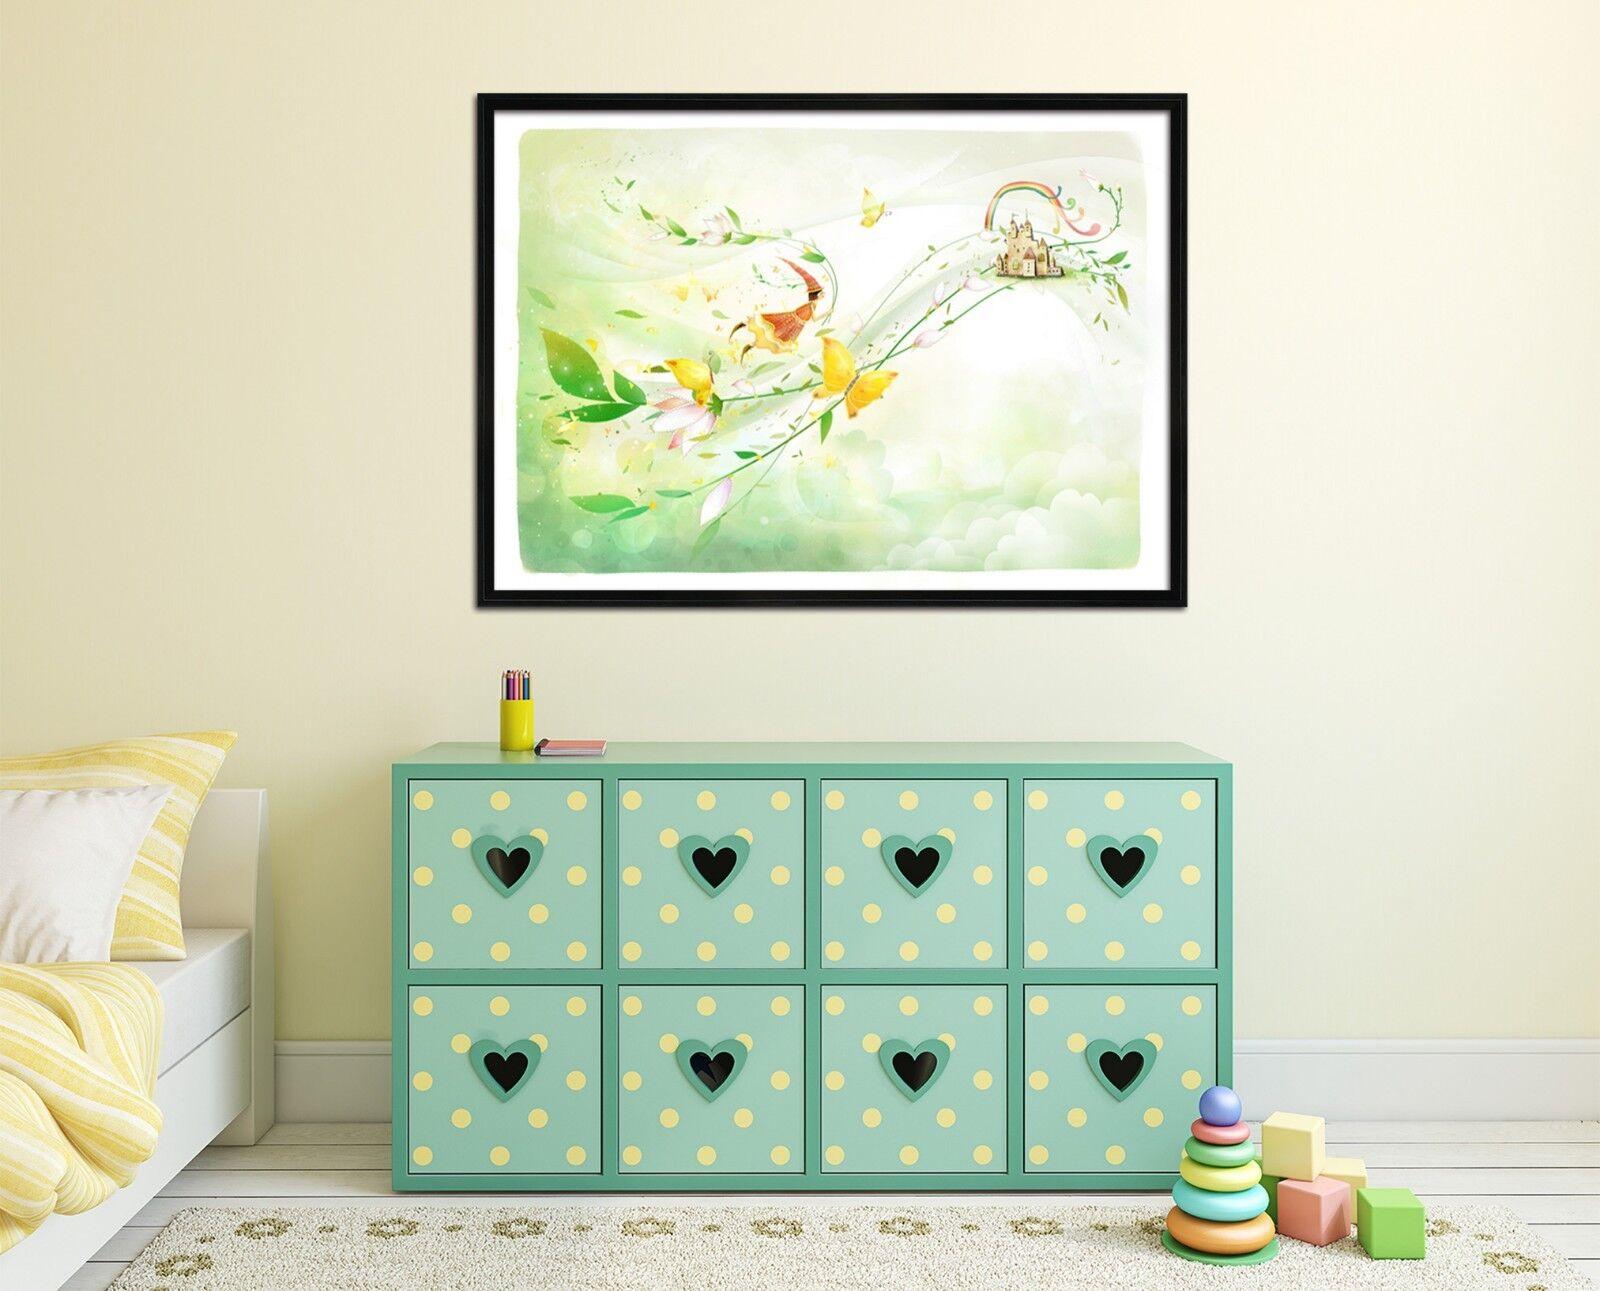 3D Mariposa Castillo 67 Enmarcado Póster Decoración del Hogar Pintura de Impresión Arte AJ Wallpaper